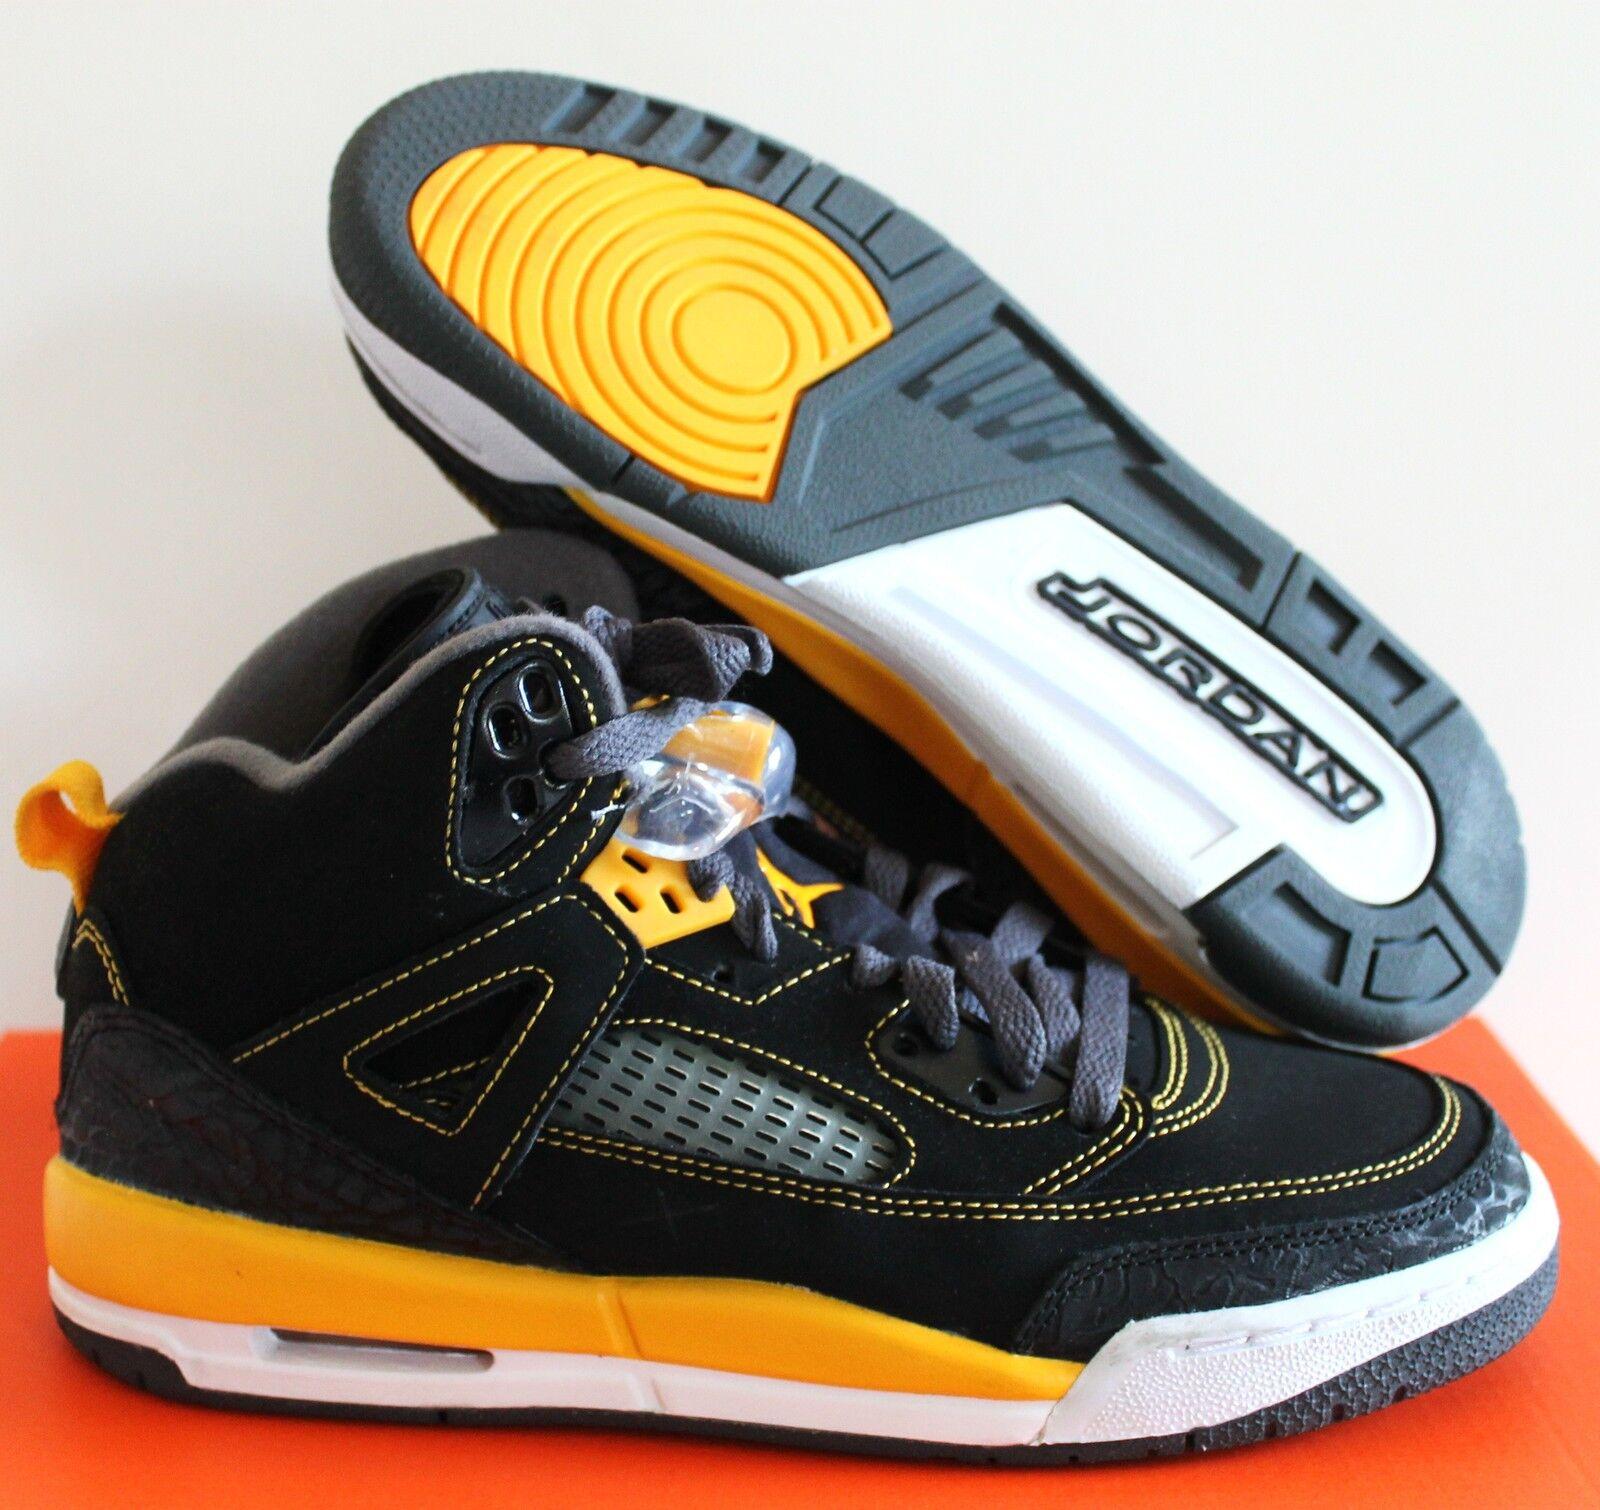 Nike Jordan Spizike (GS) Negro-UNVRSTY Negro-UNVRSTY Negro-UNVRSTY ORO y // Mujeres [317321 030] 0d9b0f